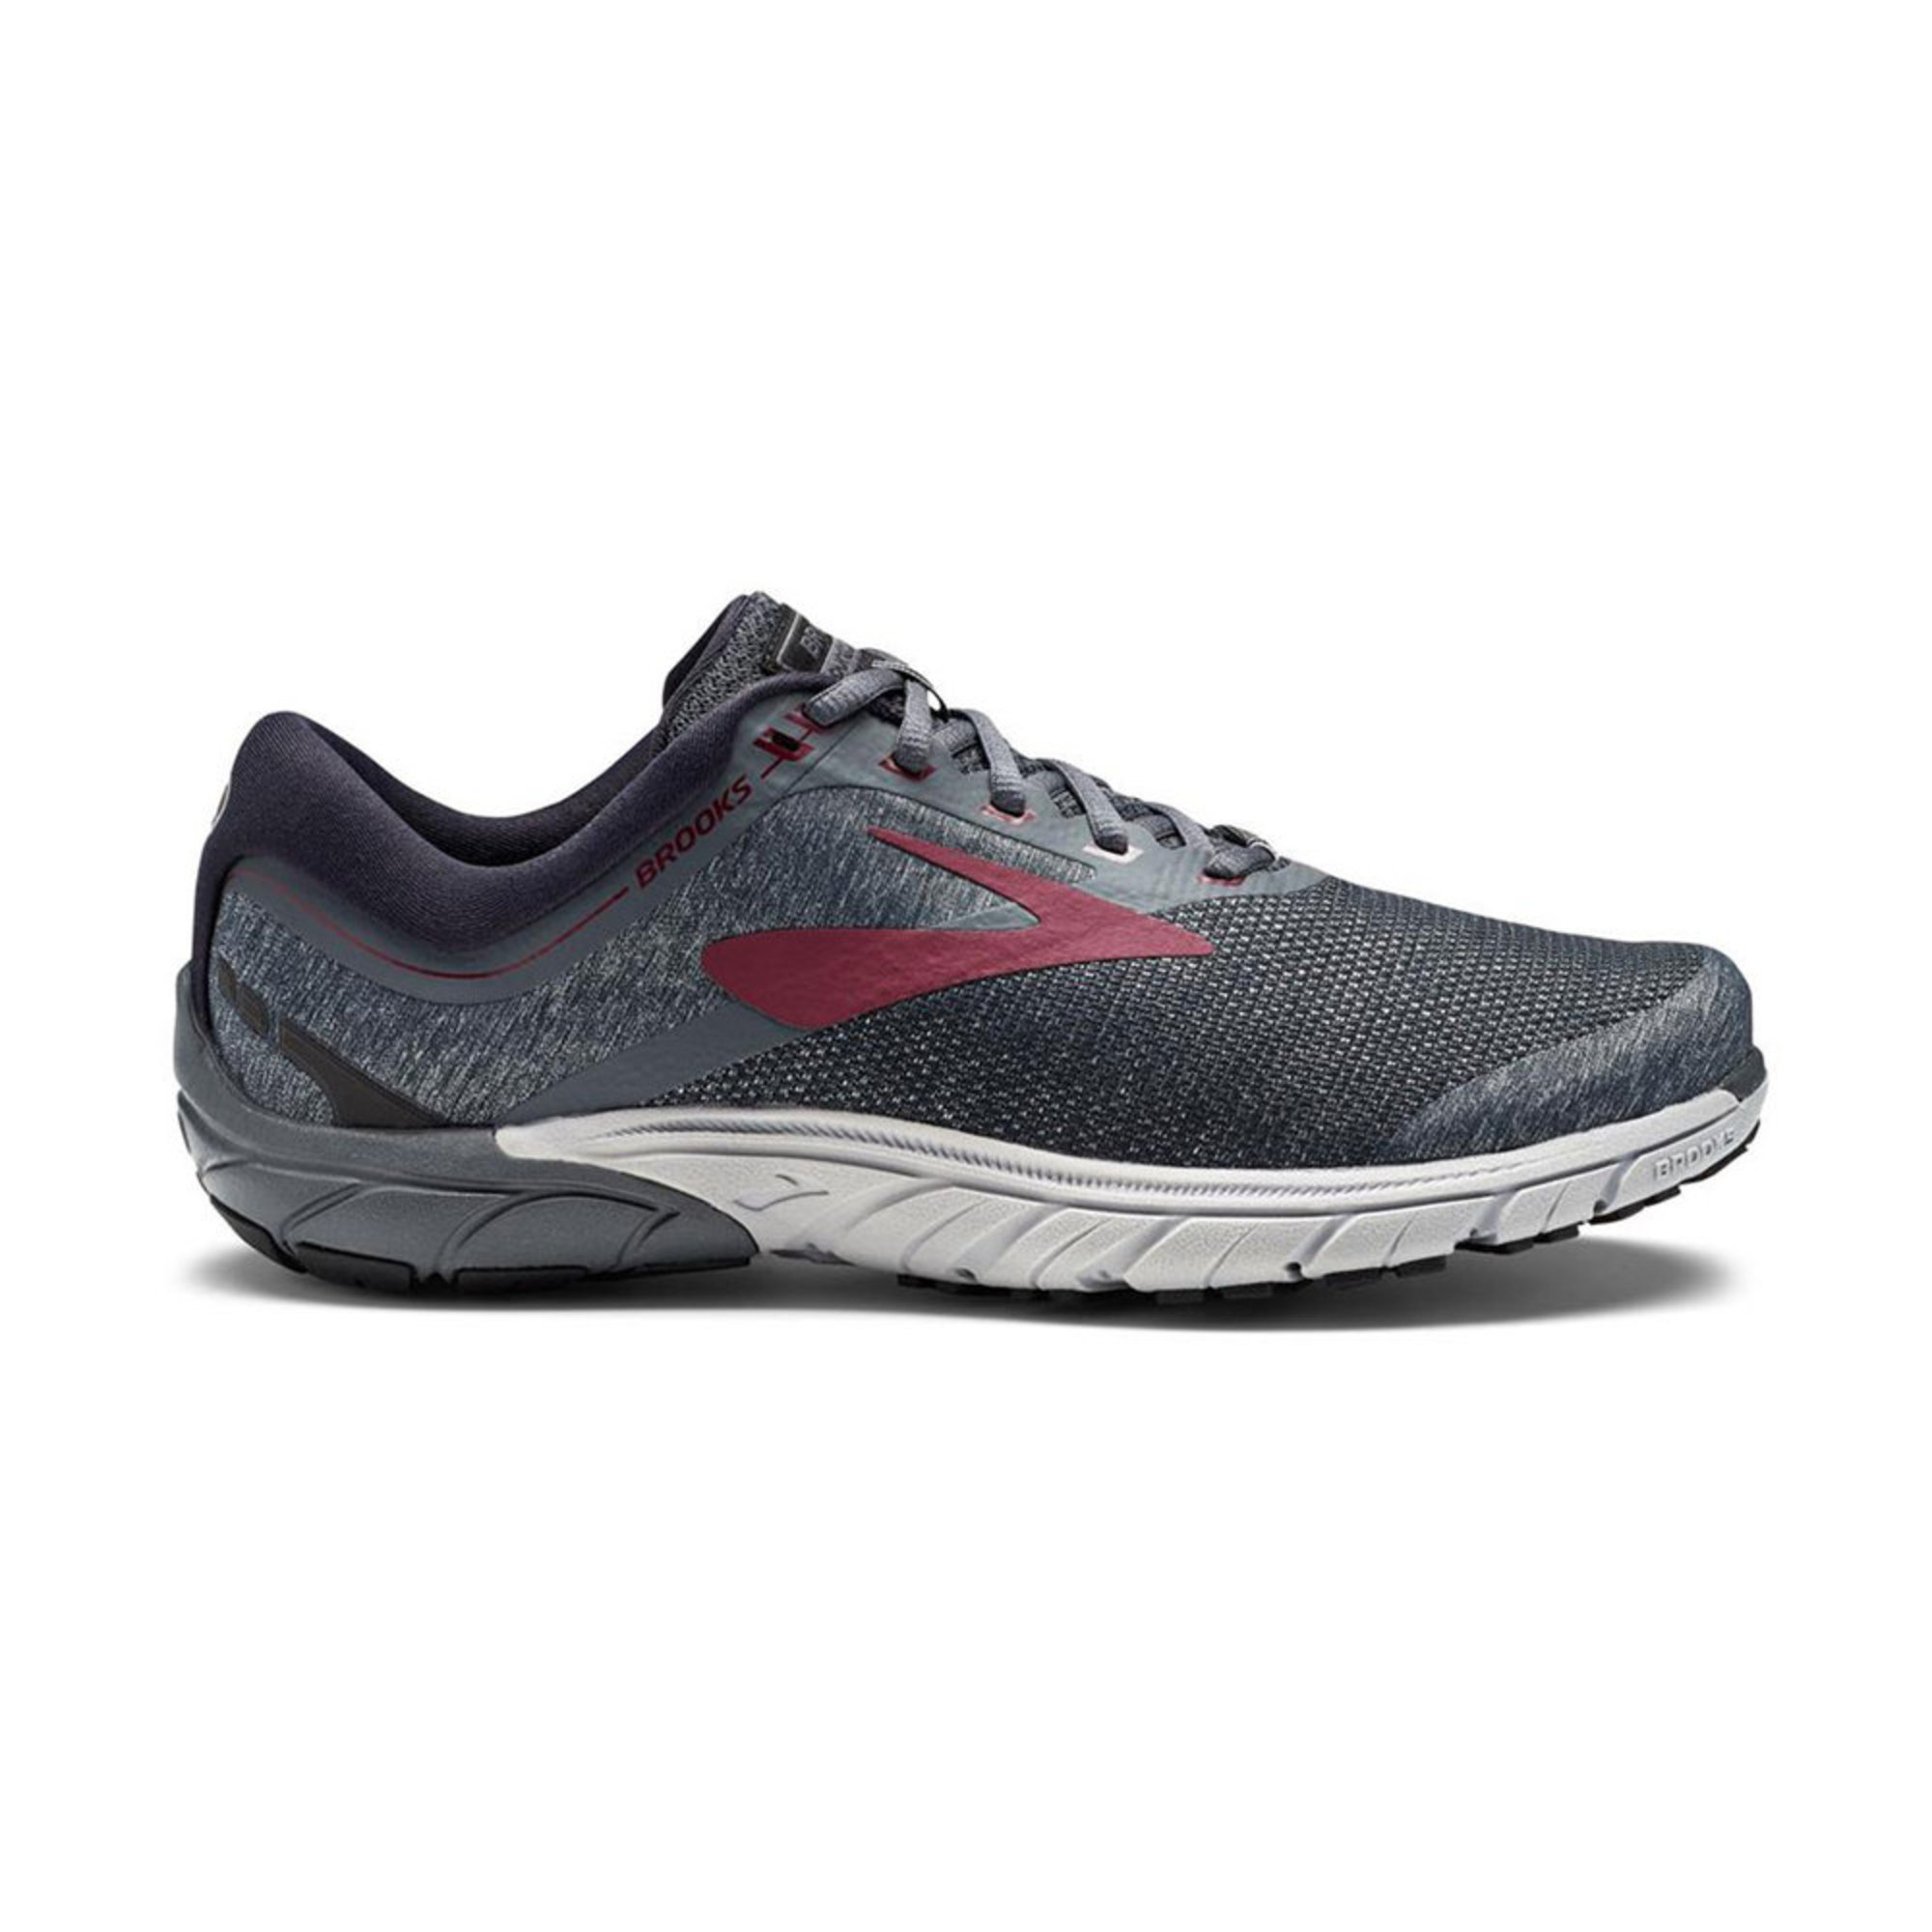 1cb8207c8318e Brooks. Brooks Men s Pure Cadence 7 Running Shoe